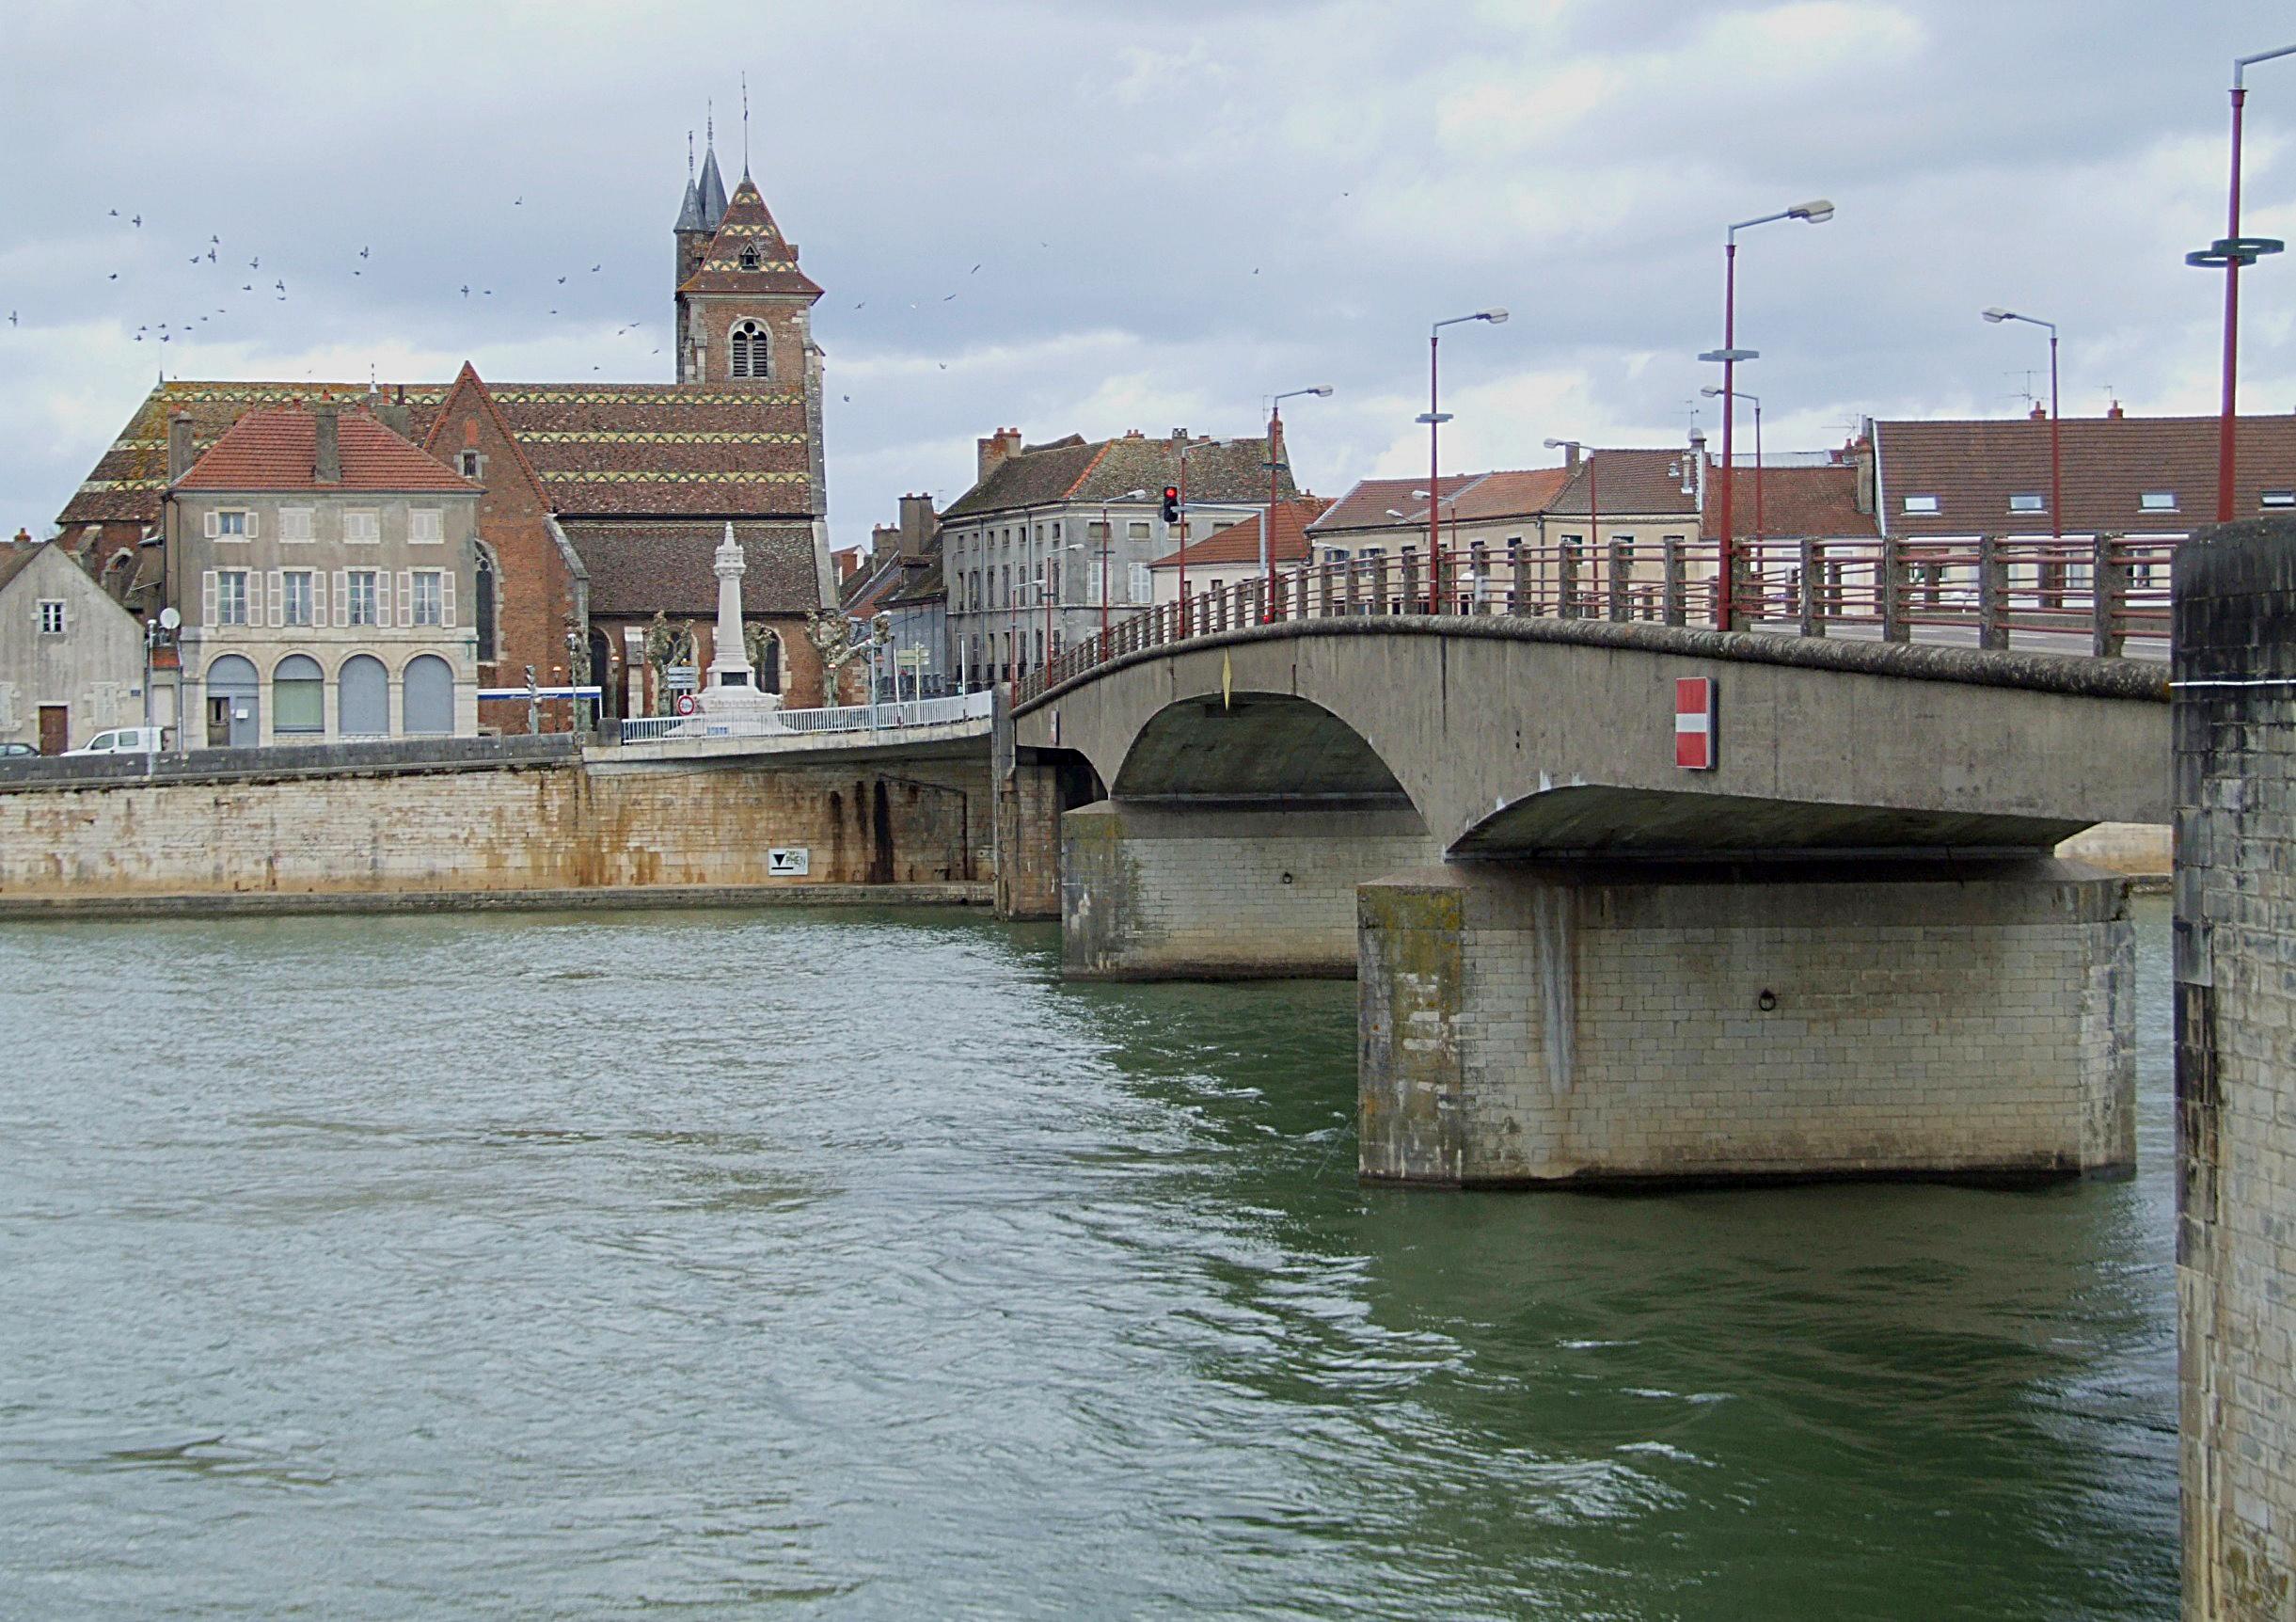 Saint-jean-de-losne